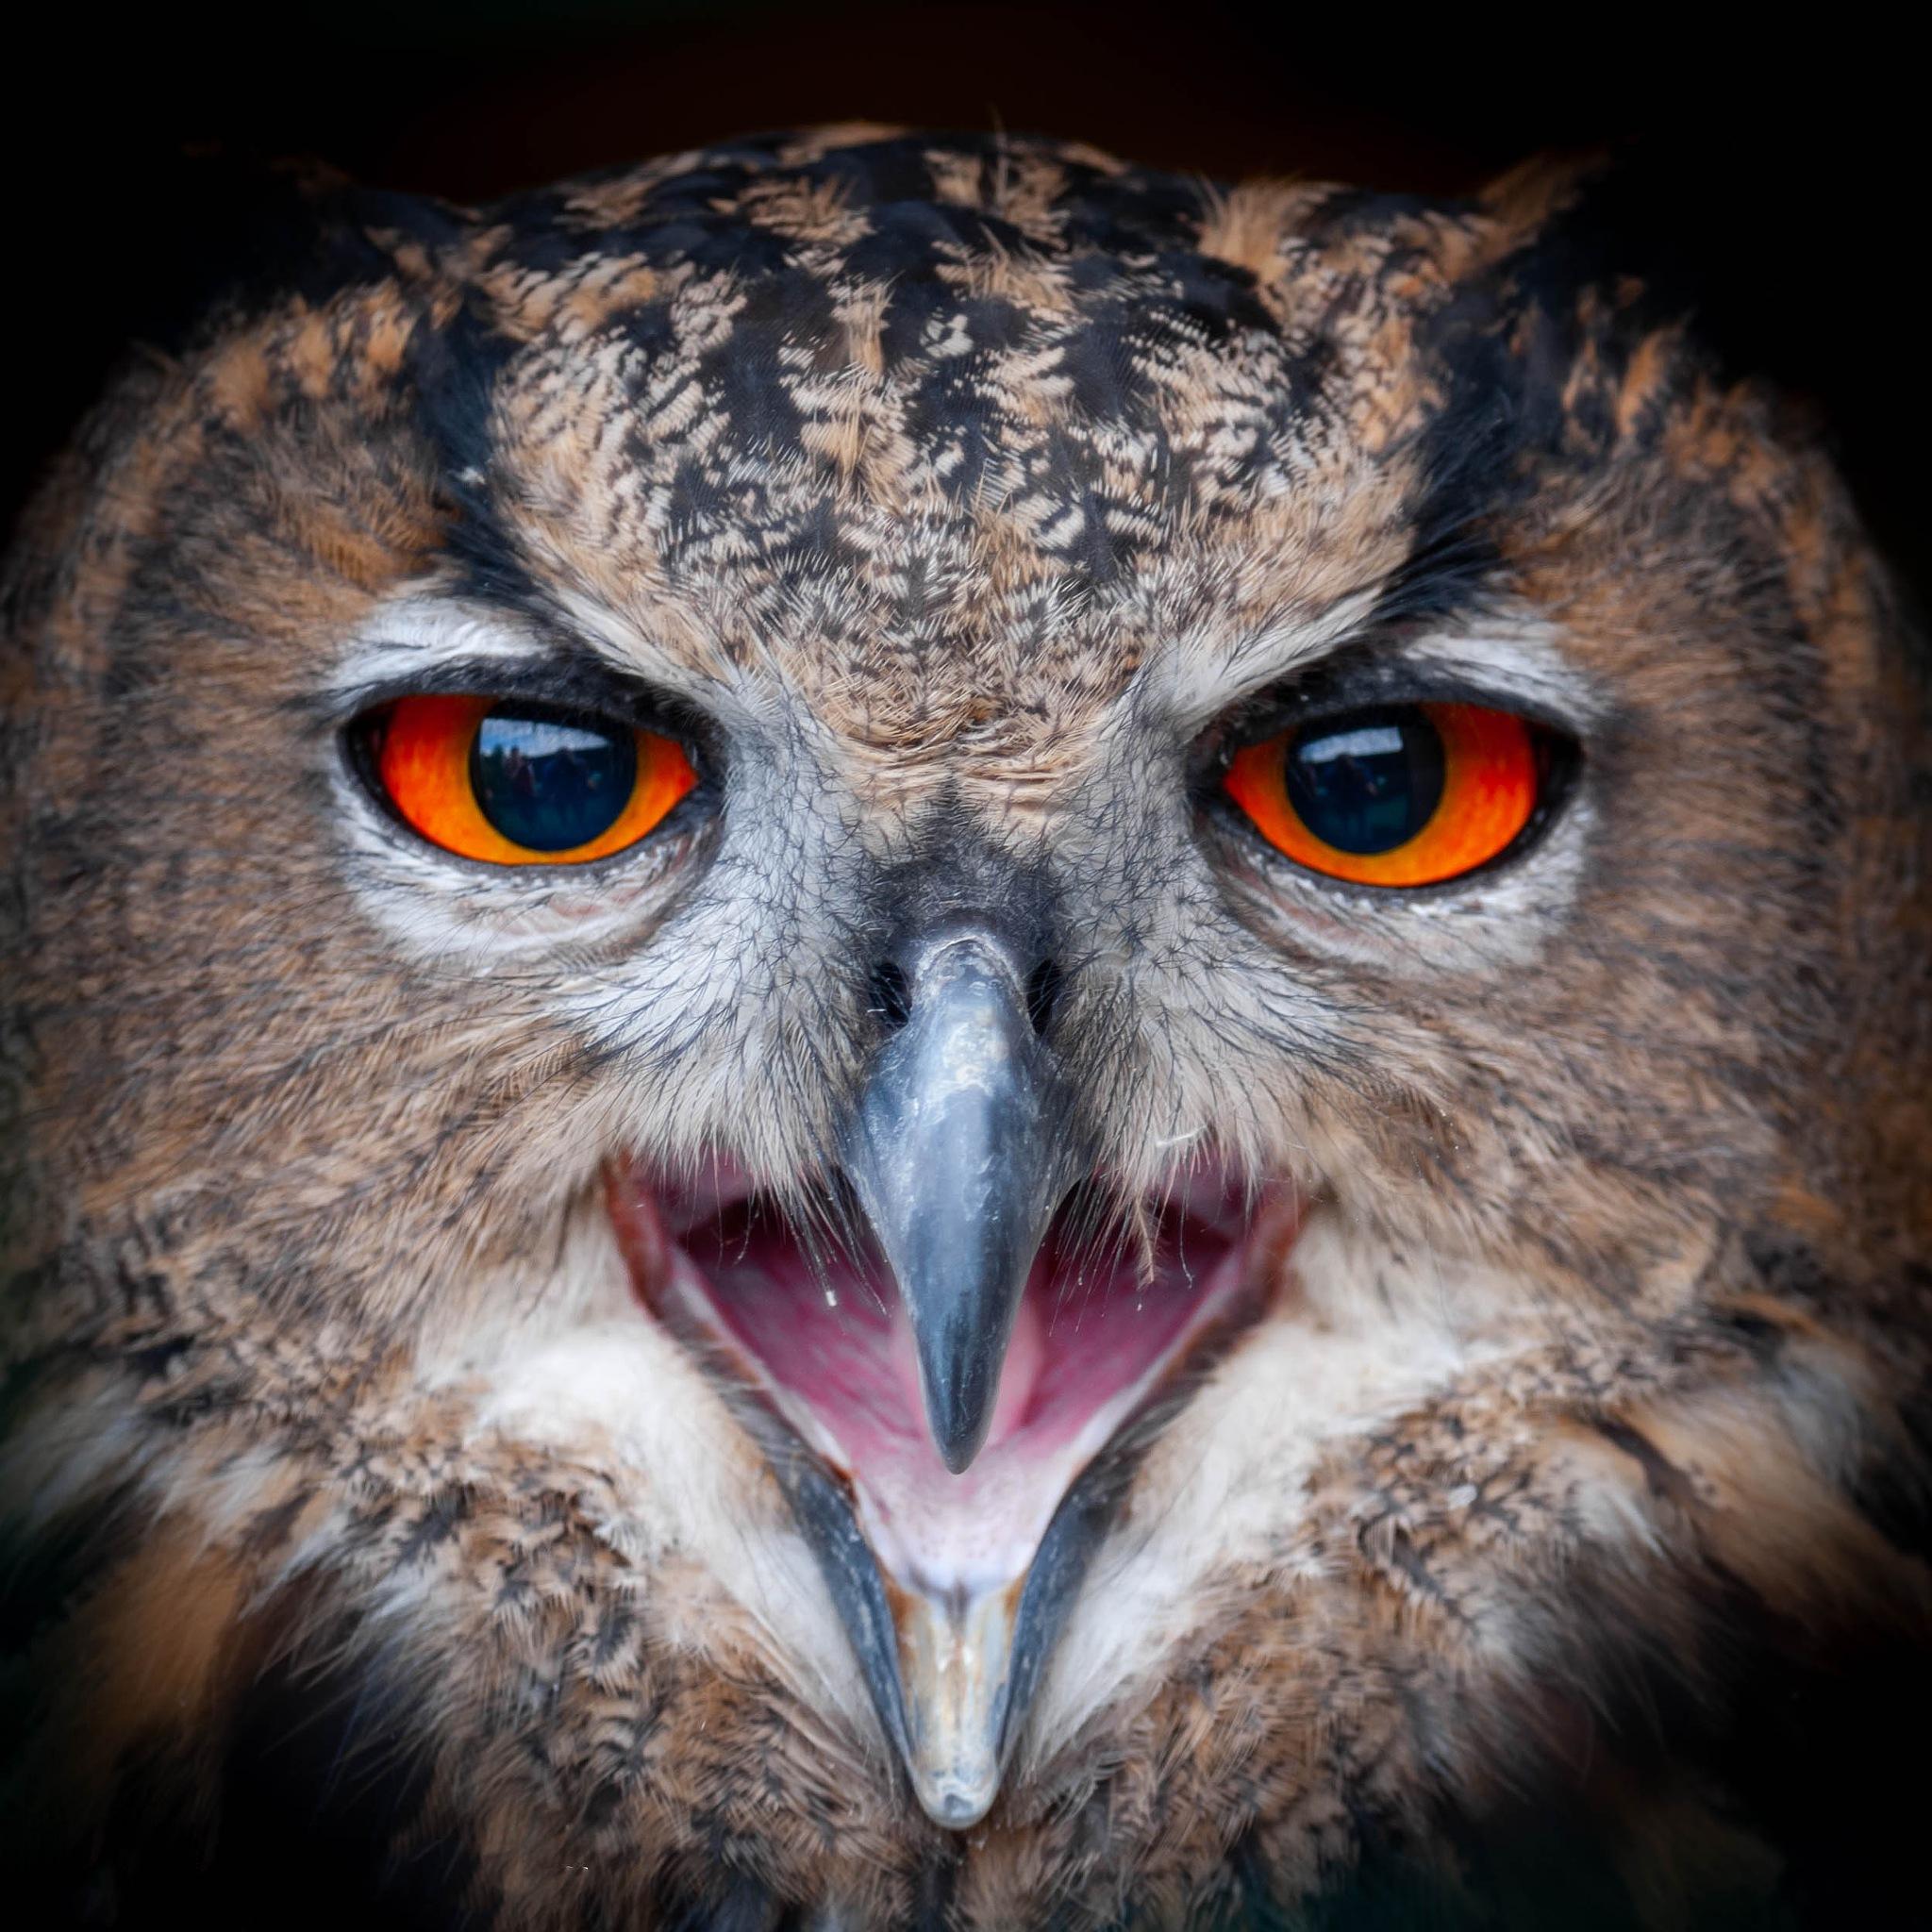 European Eagle Owl - Portrait close up by PaulsImaging